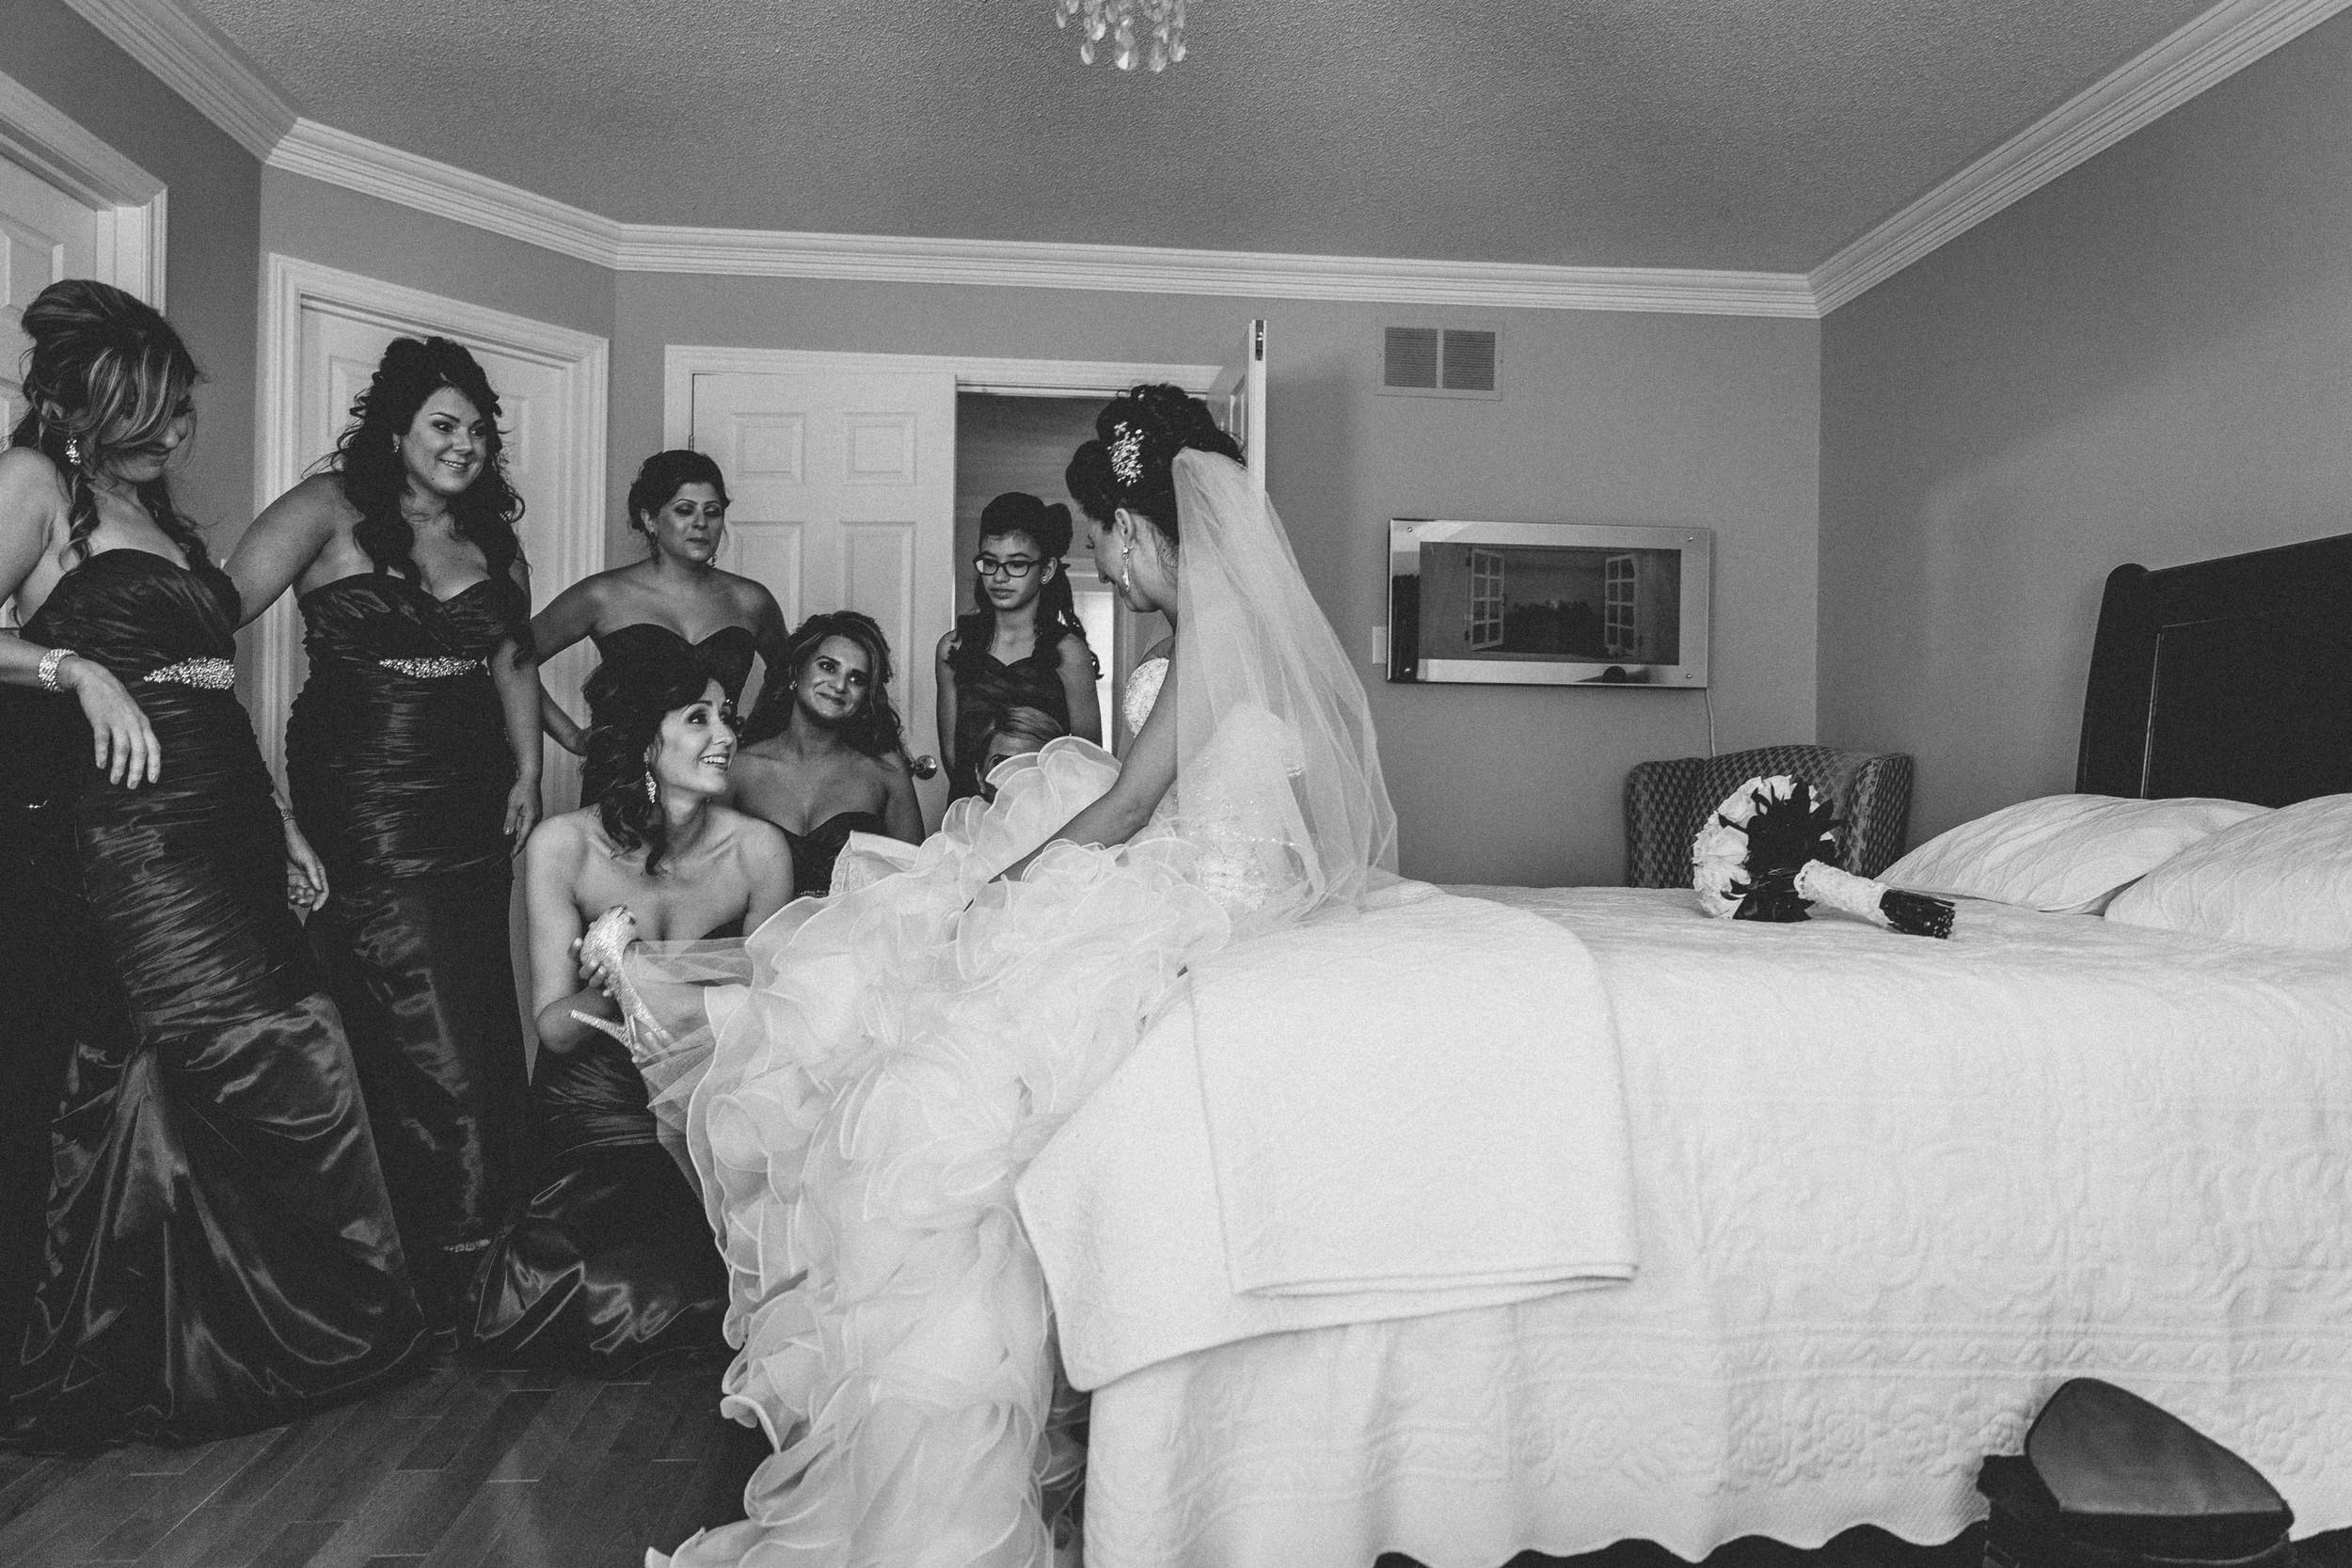 Toronto Wedding Photography | Caterina & Elvis, Pickering catholic wedding (23 of 39).jpg